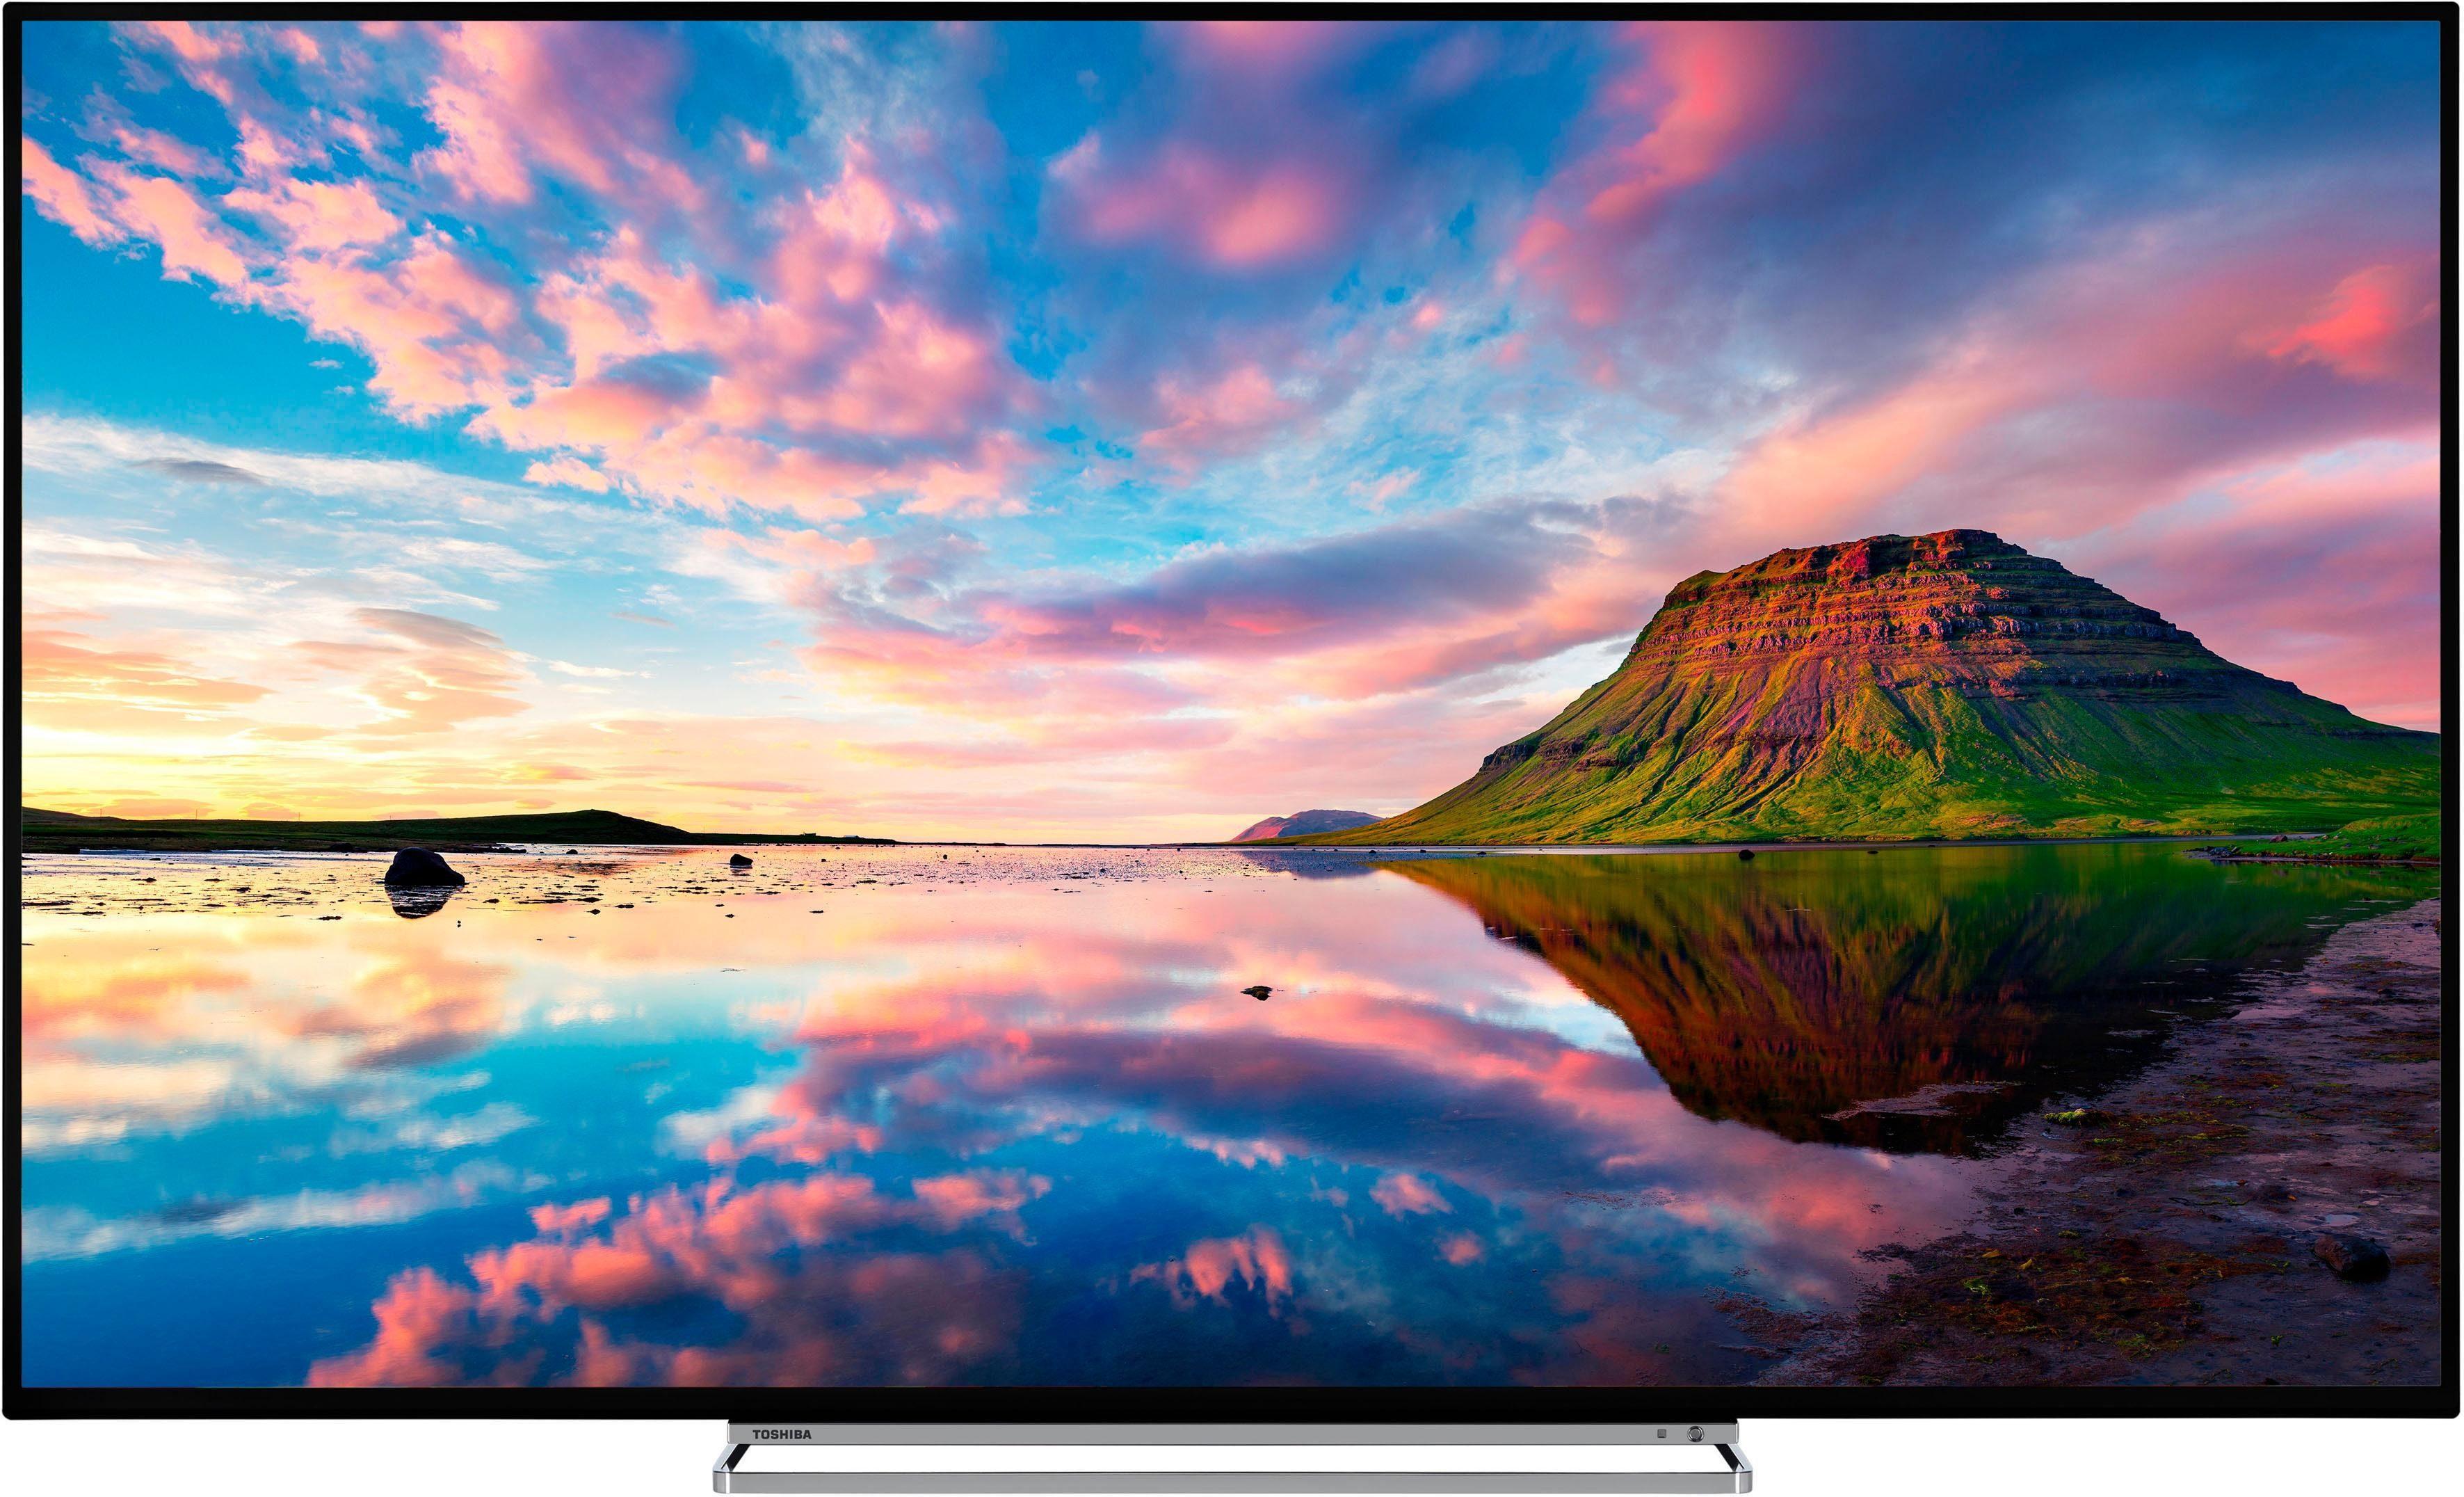 Toshiba 65U5863DA LED-Fernseher (165 cm/65 Zoll, 4K Ultra HD, Smart-TV, Dolby Vision HDR, HDR10, HLG)